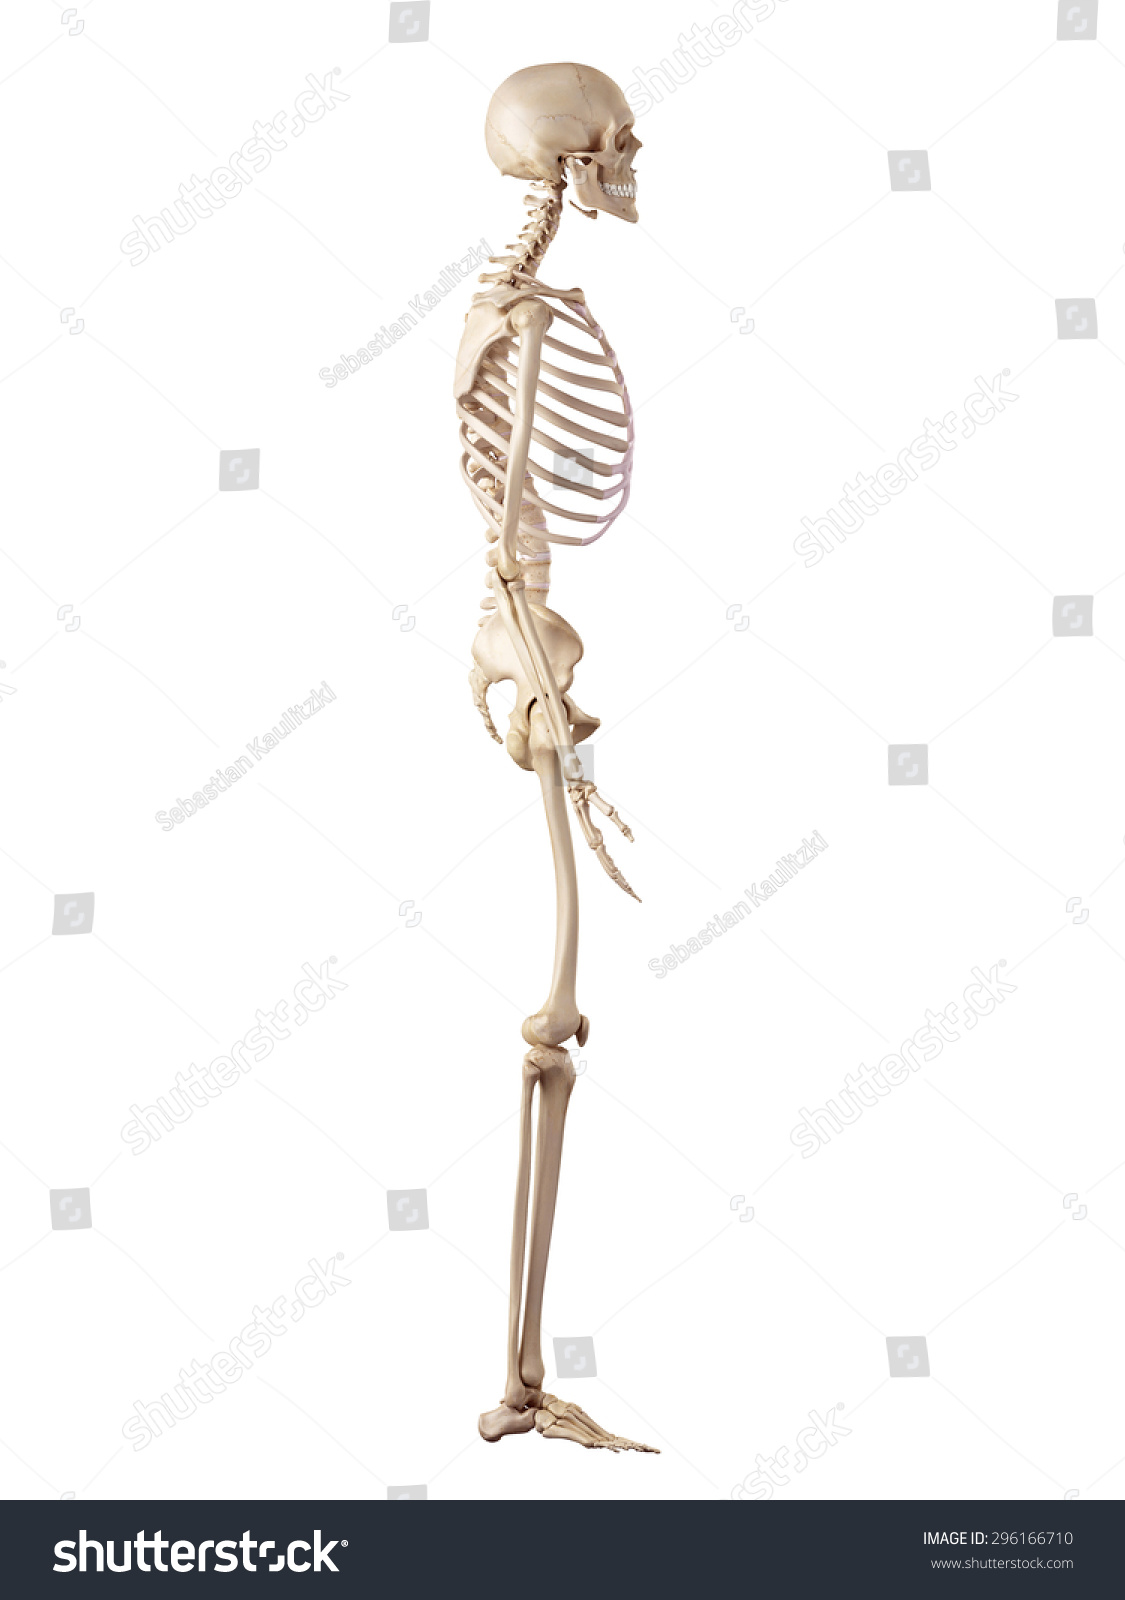 Medical Accurate Illustration Human Skeleton Stock Illustration